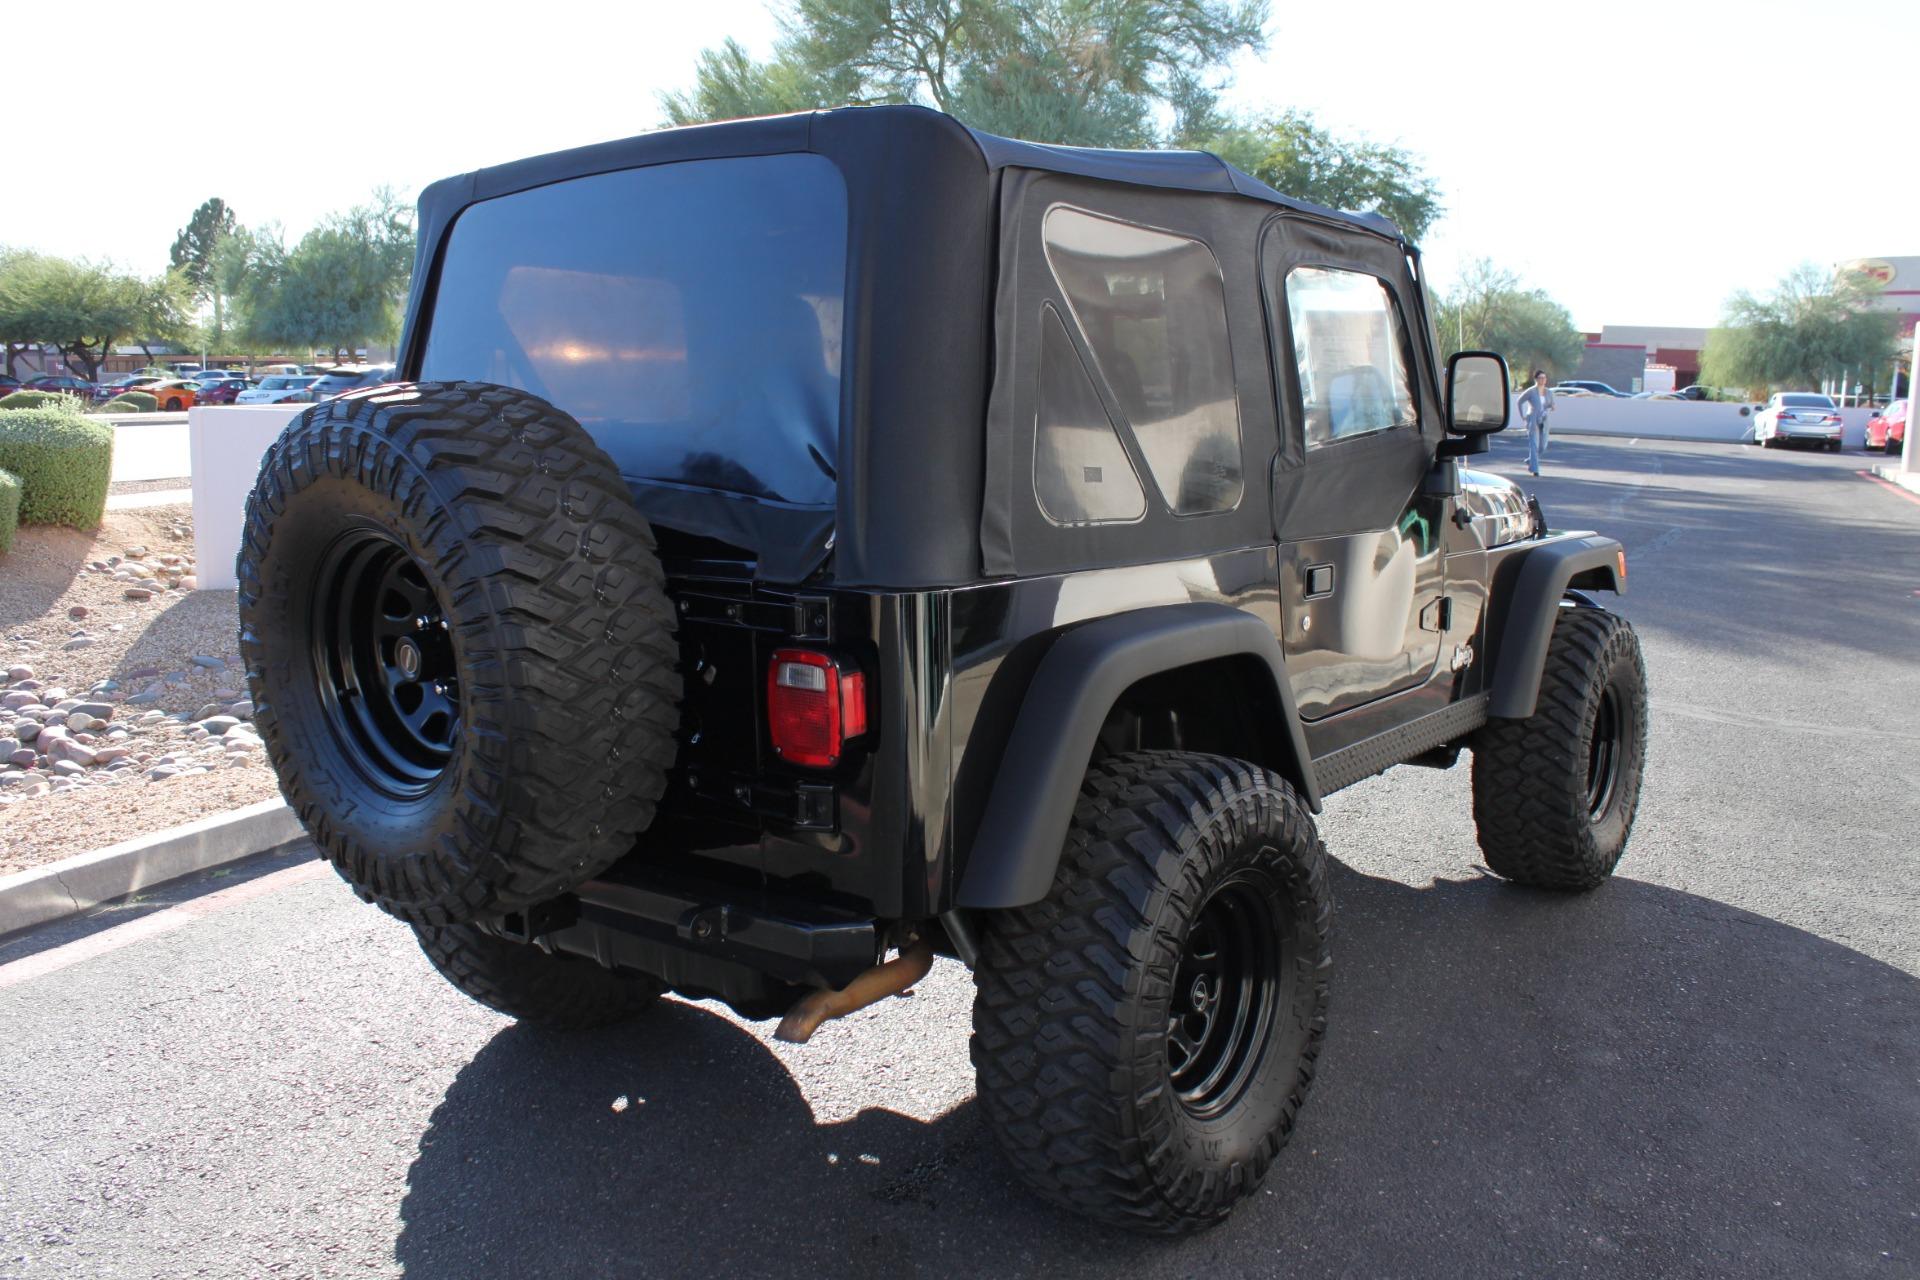 Used-2004-Jeep-Wrangler-Rubicon-Classic